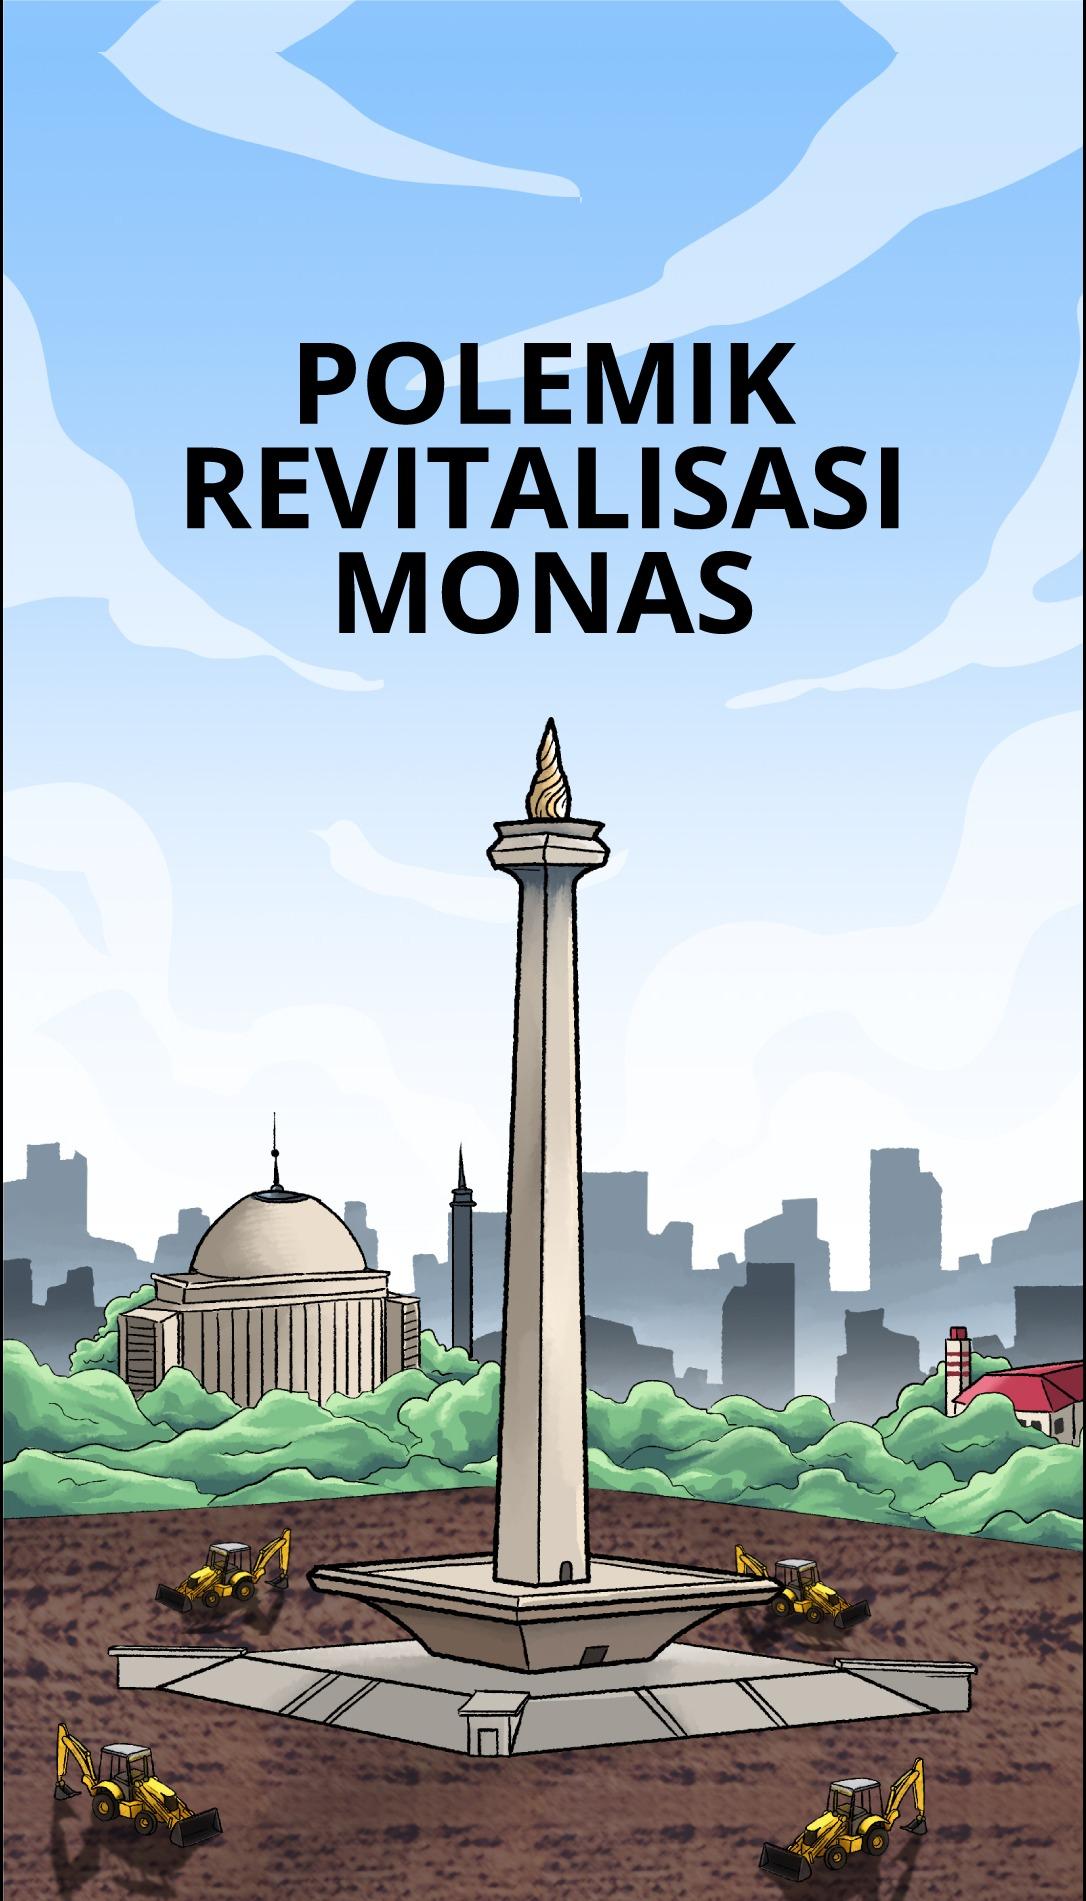 Polemik Revitalisasi Monas 2